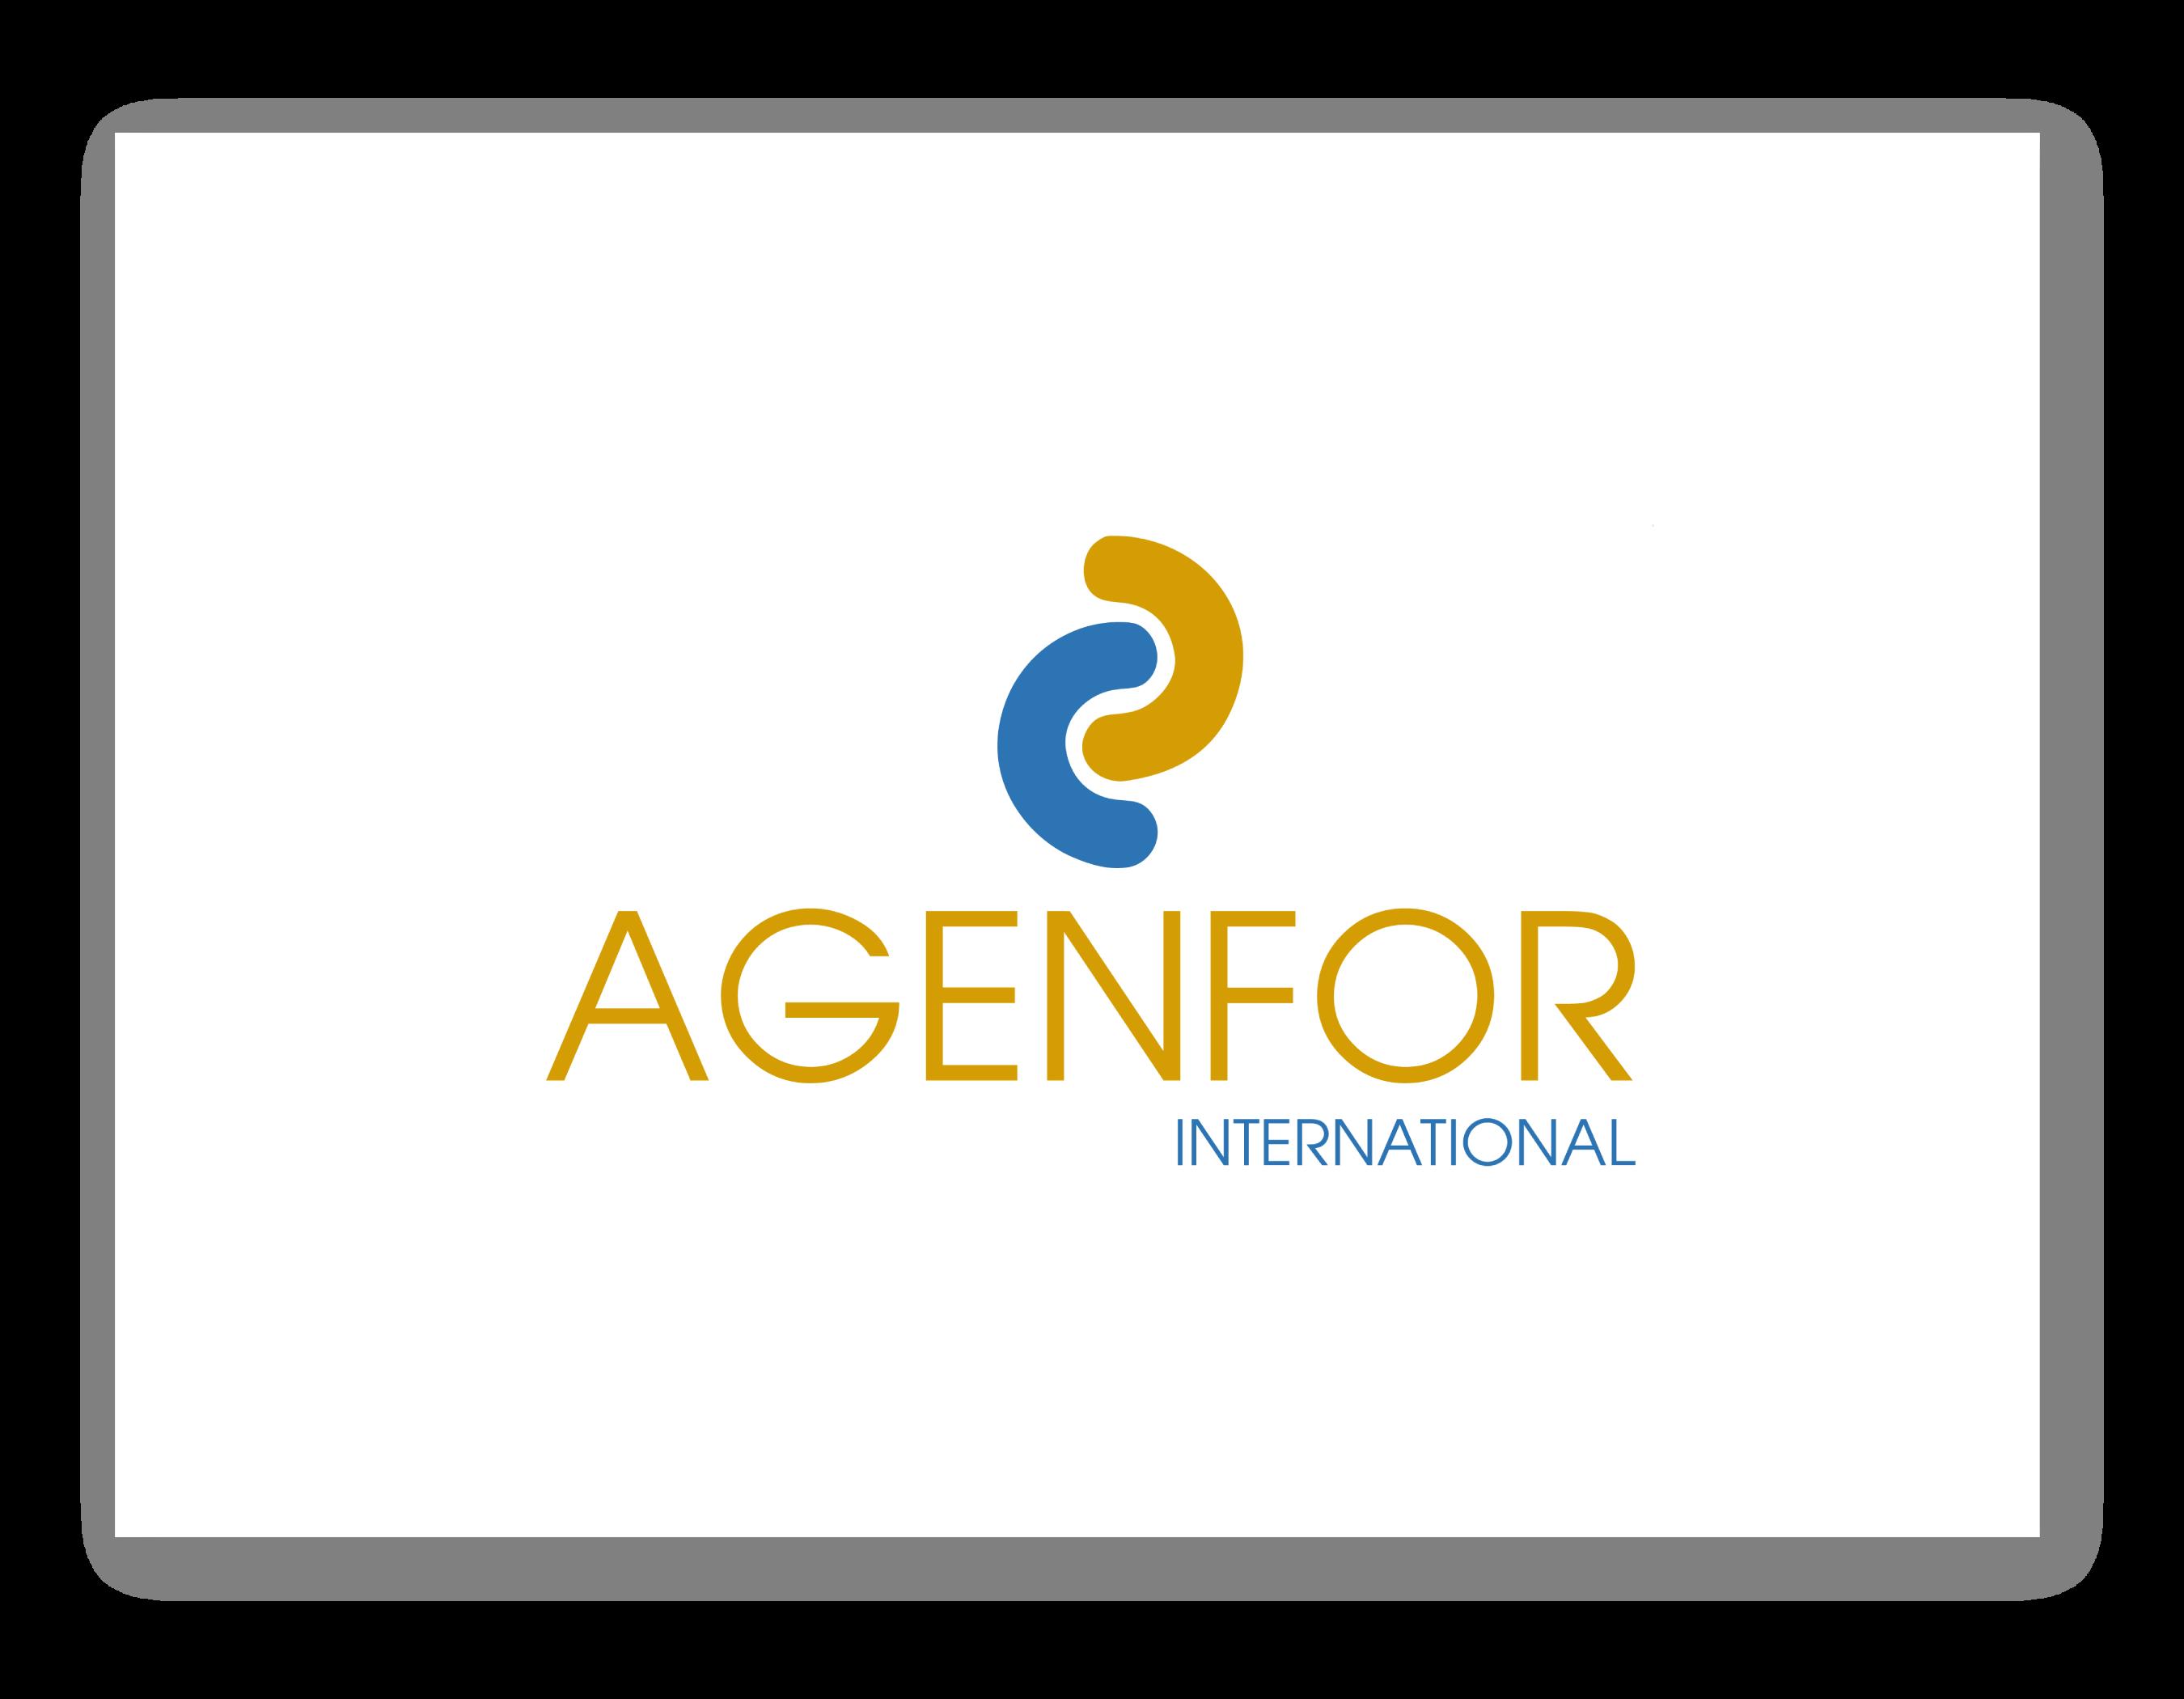 Agenfor International, Italy